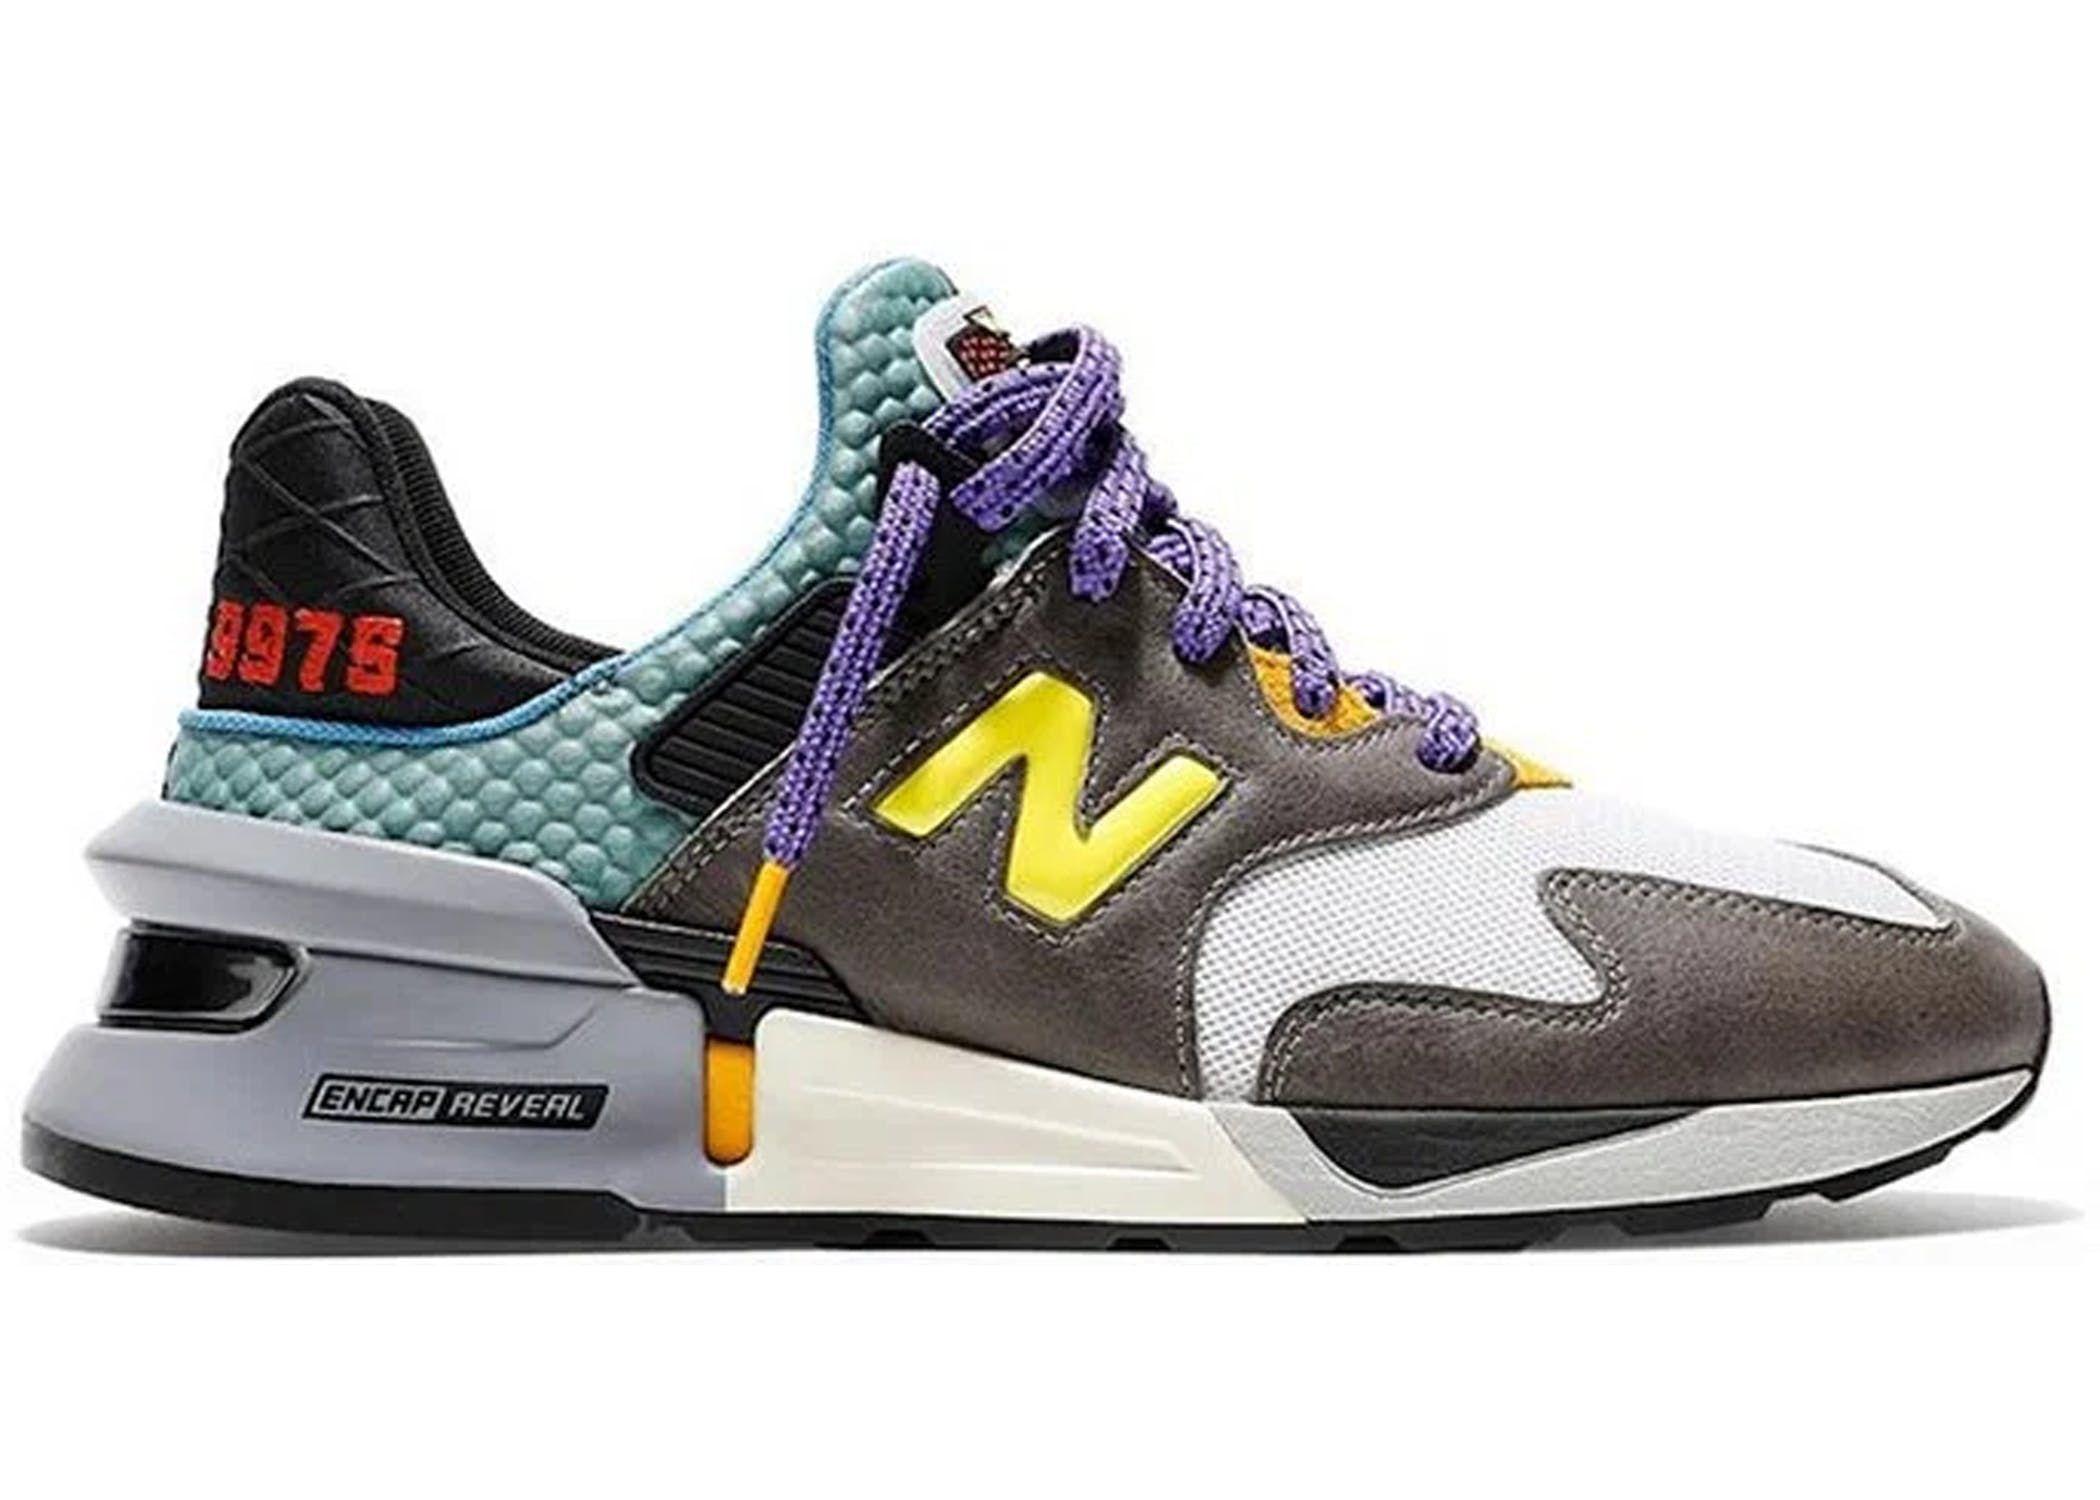 Check out the New Balance 997S Bodega No Bad Days